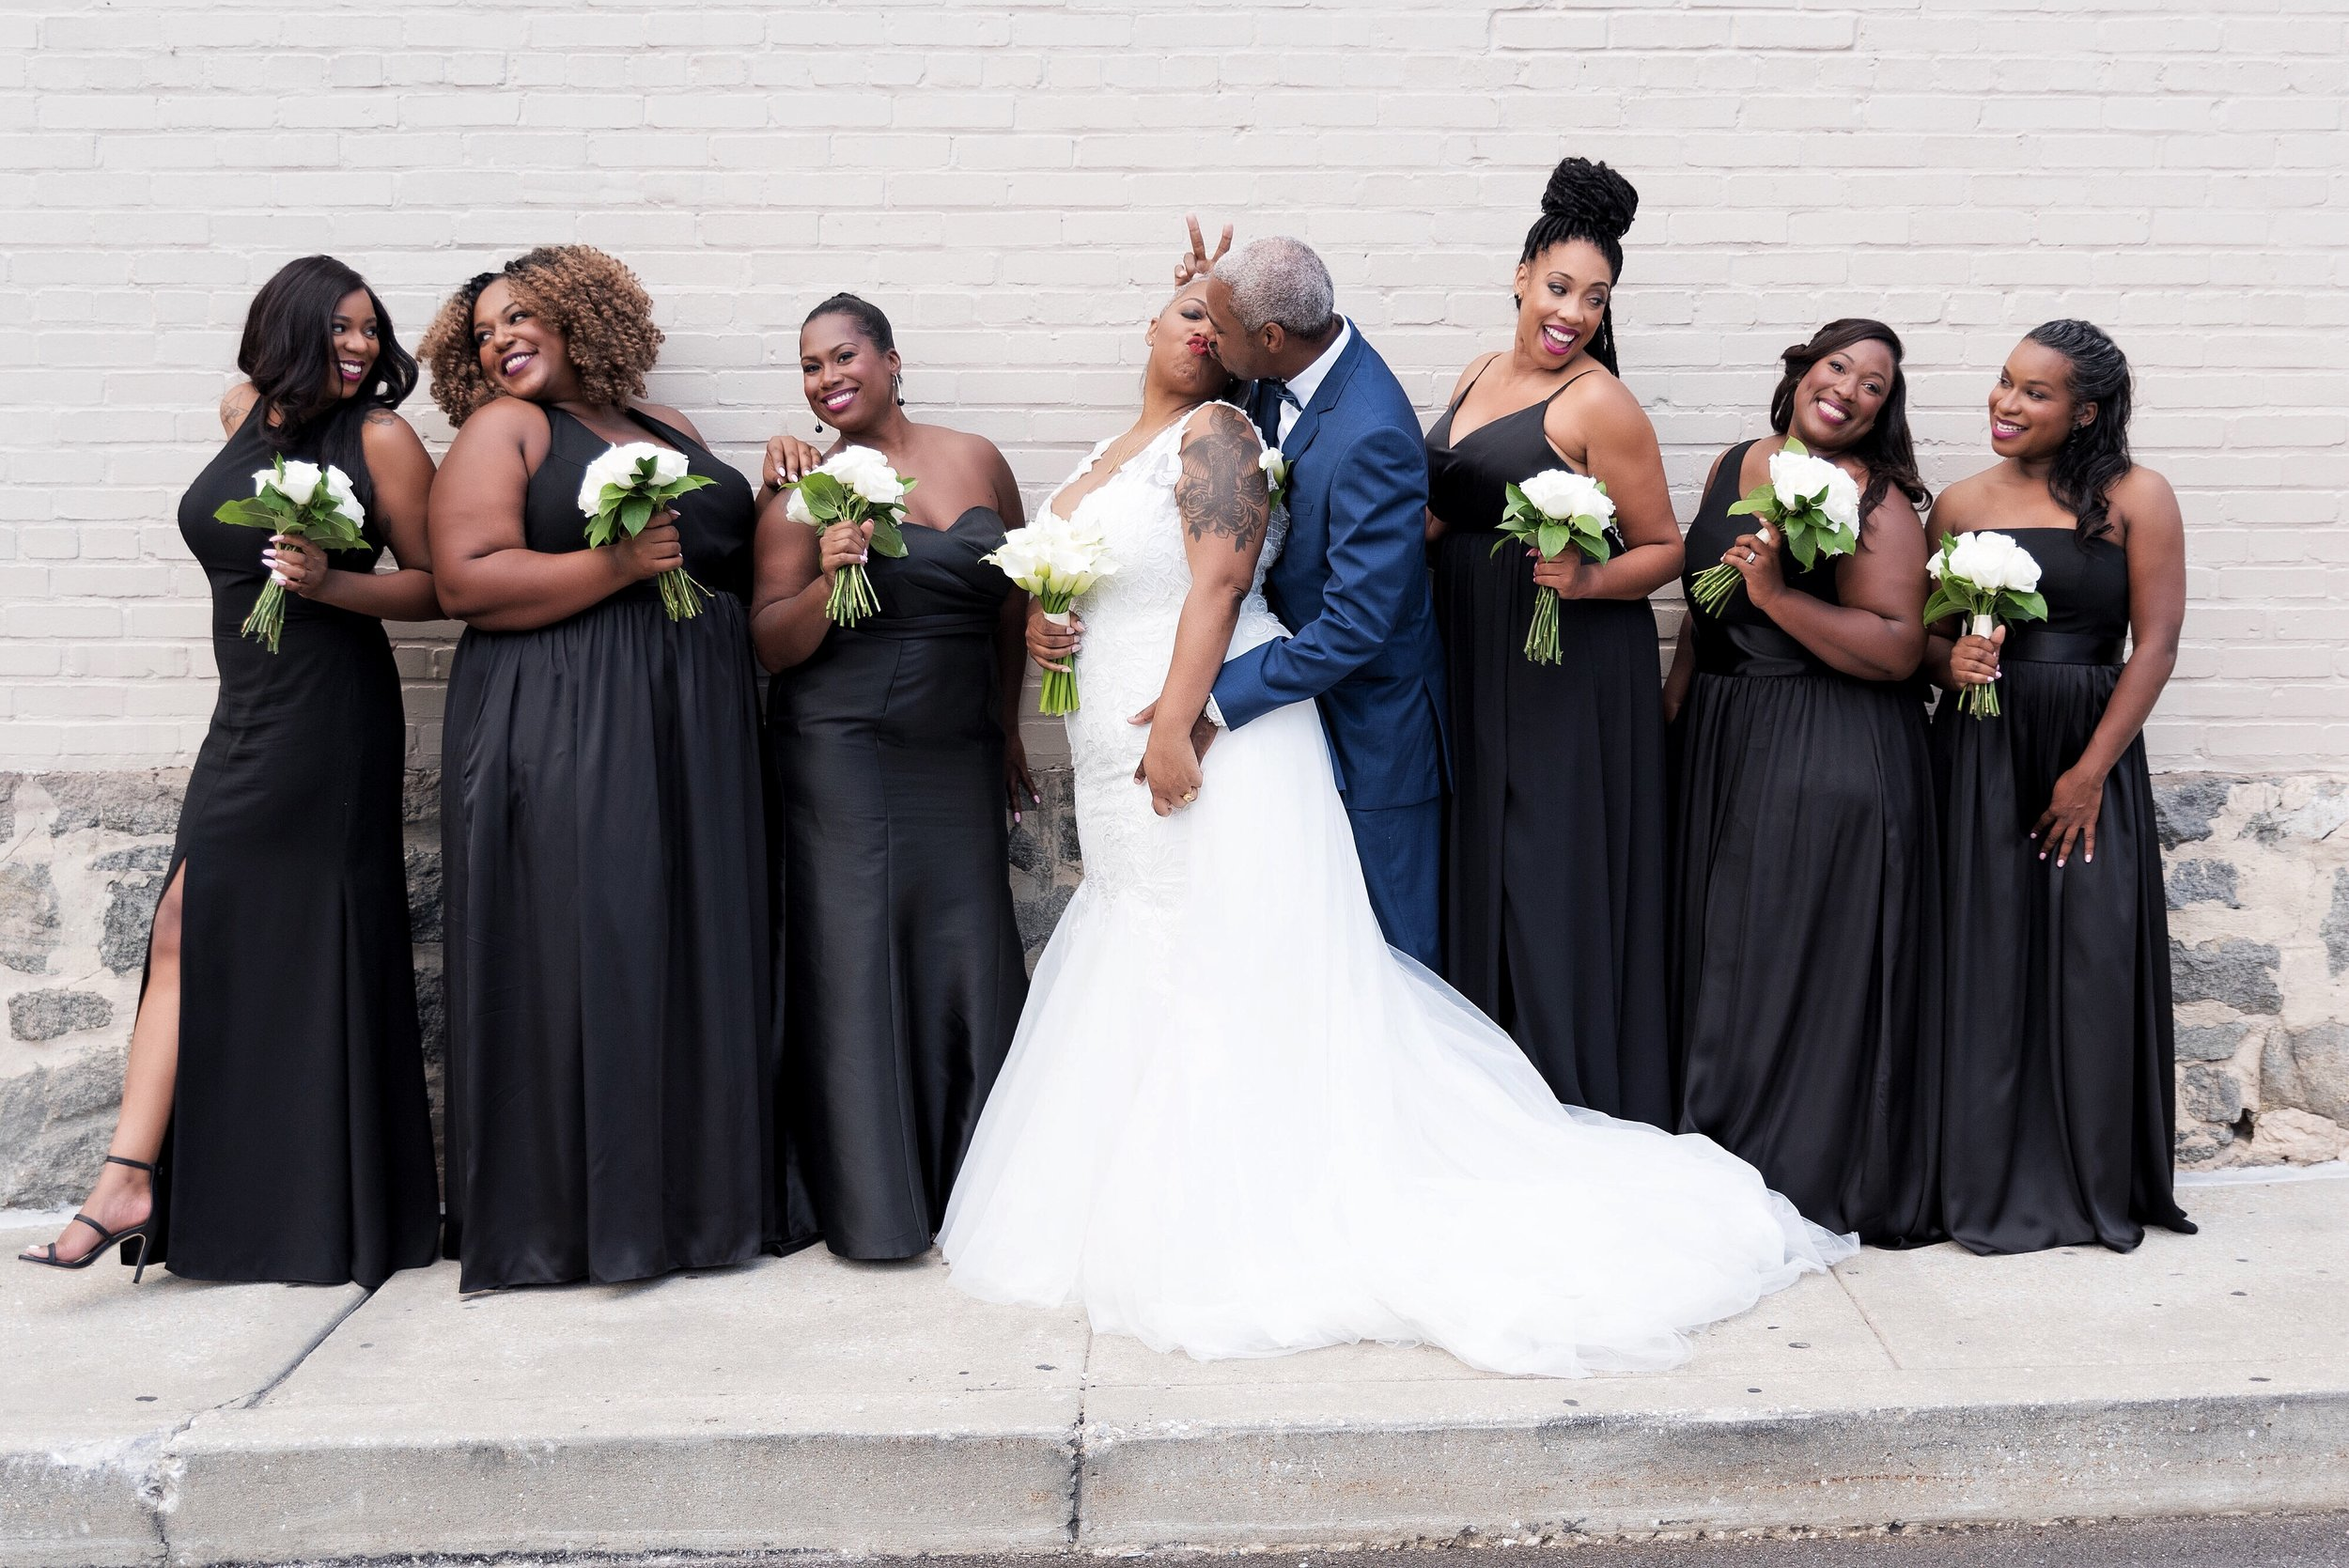 Williams Wedding Formals Bridal Party - Bridesmaids 3.JPG